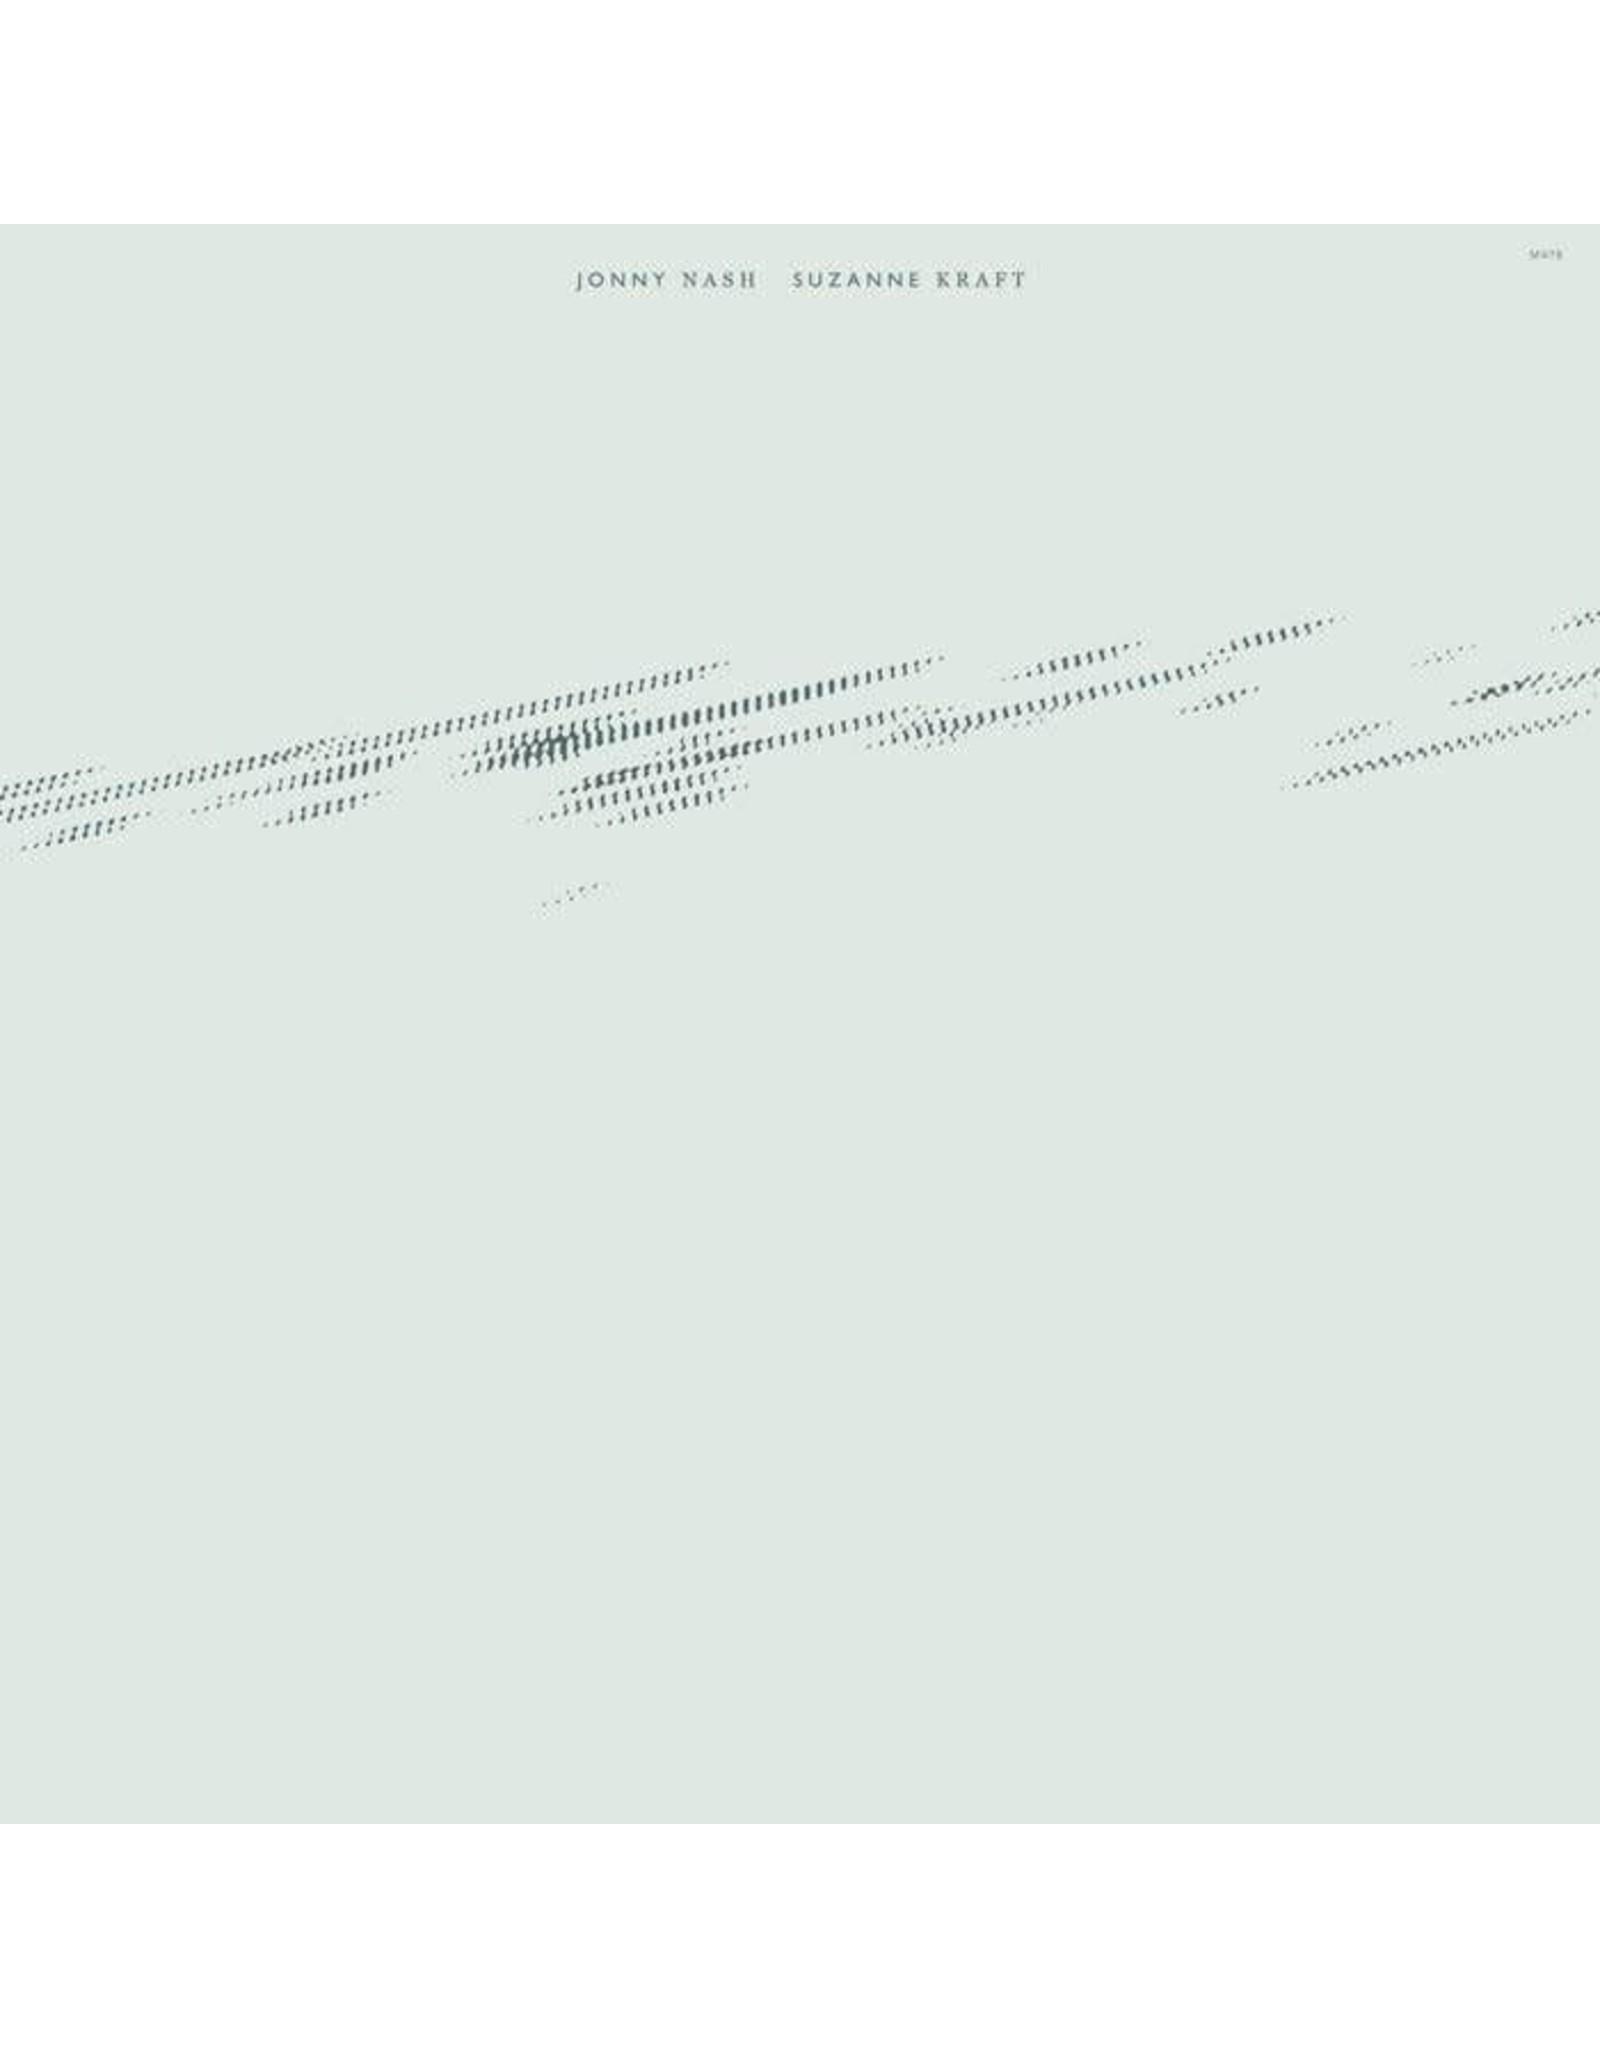 Melody As Truth Nash, Jonny/Suzanne Kraft: Passive Aggressive LP